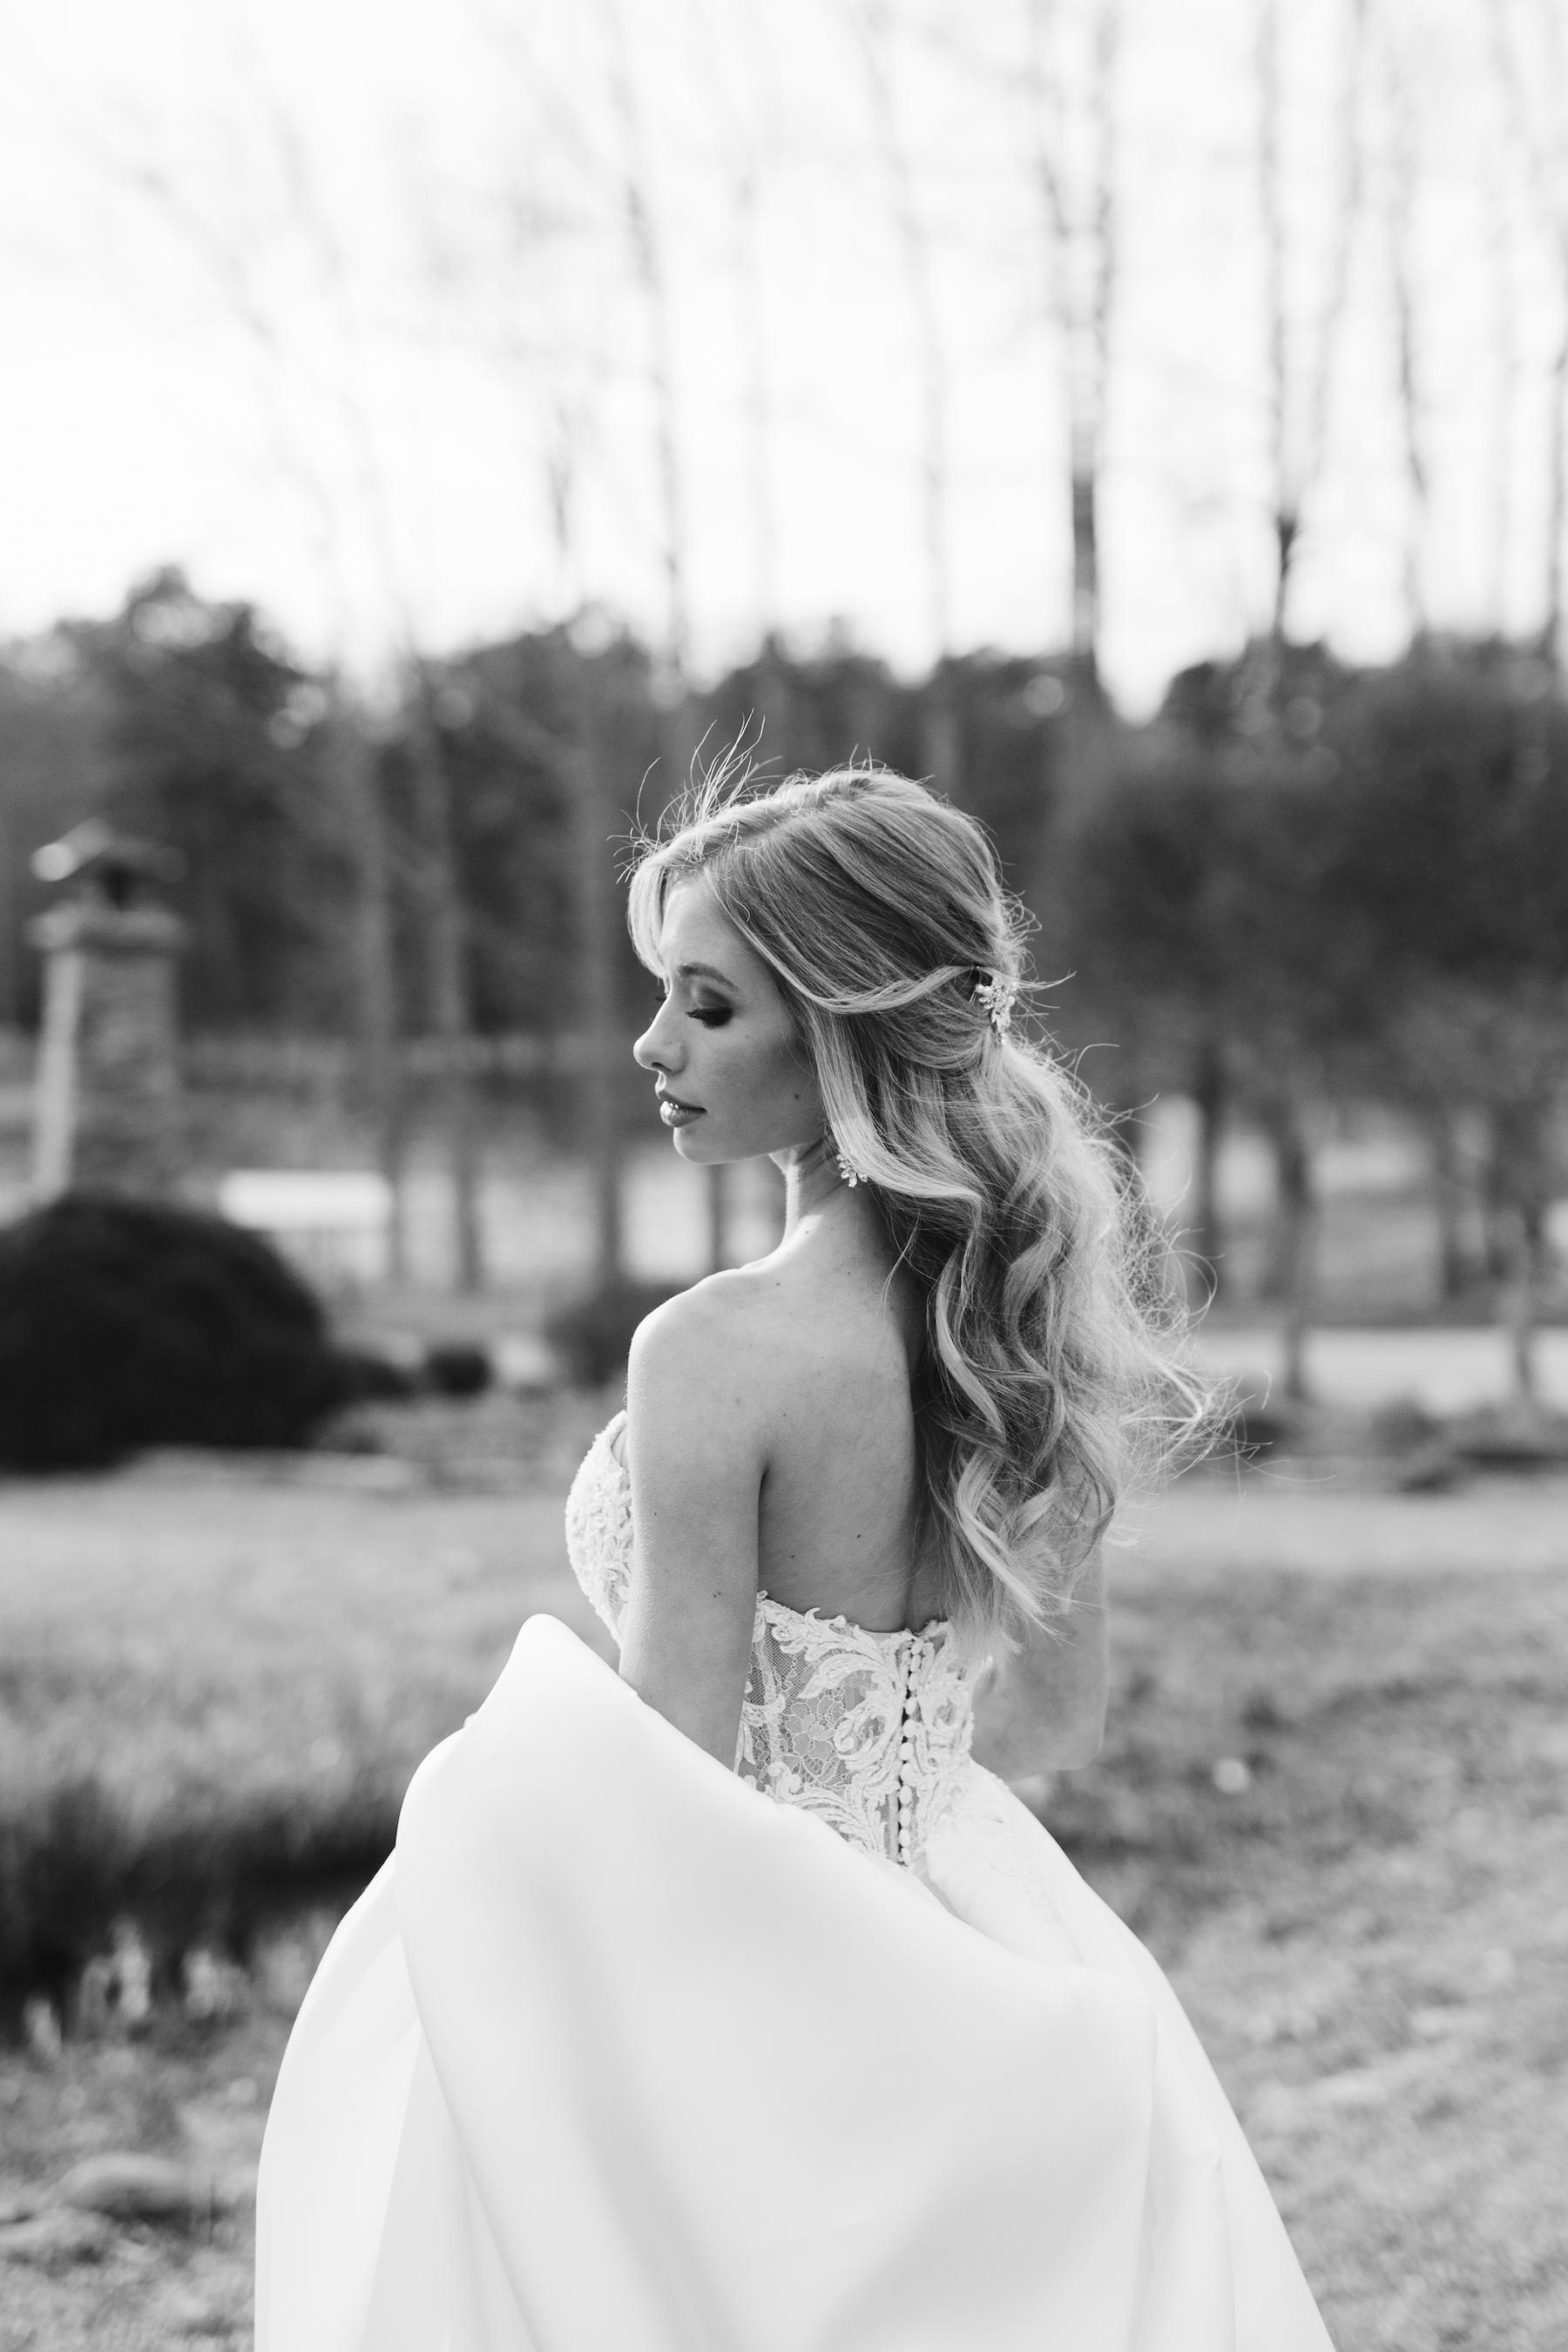 furman-university-bridals-paige-211.JPG